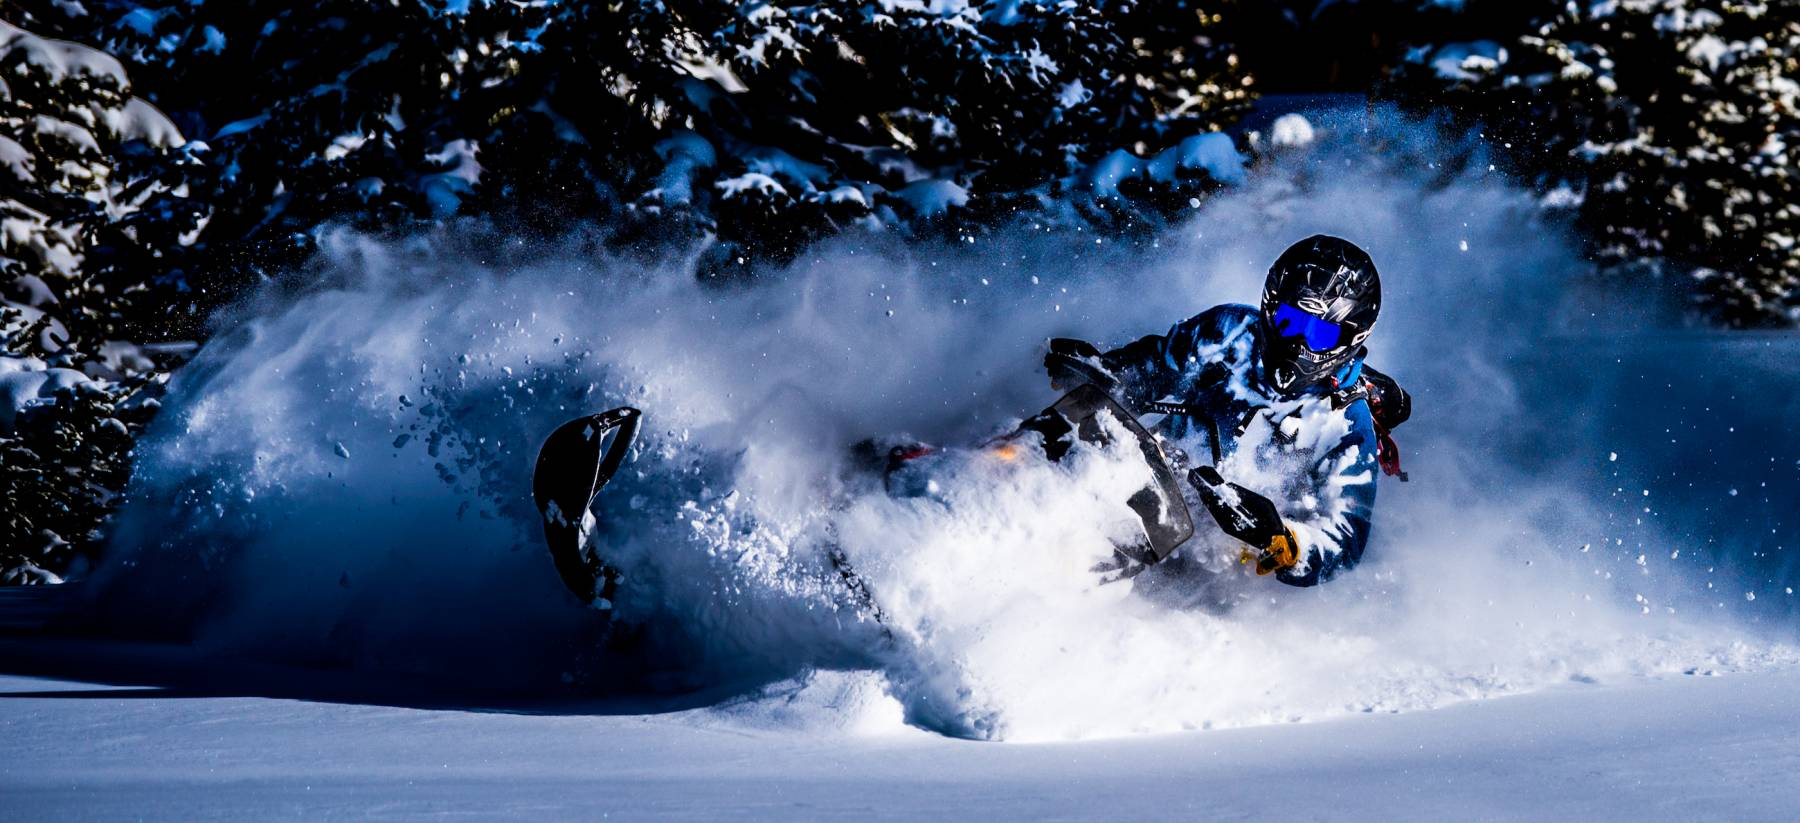 Copper Mountain Snowmobiling